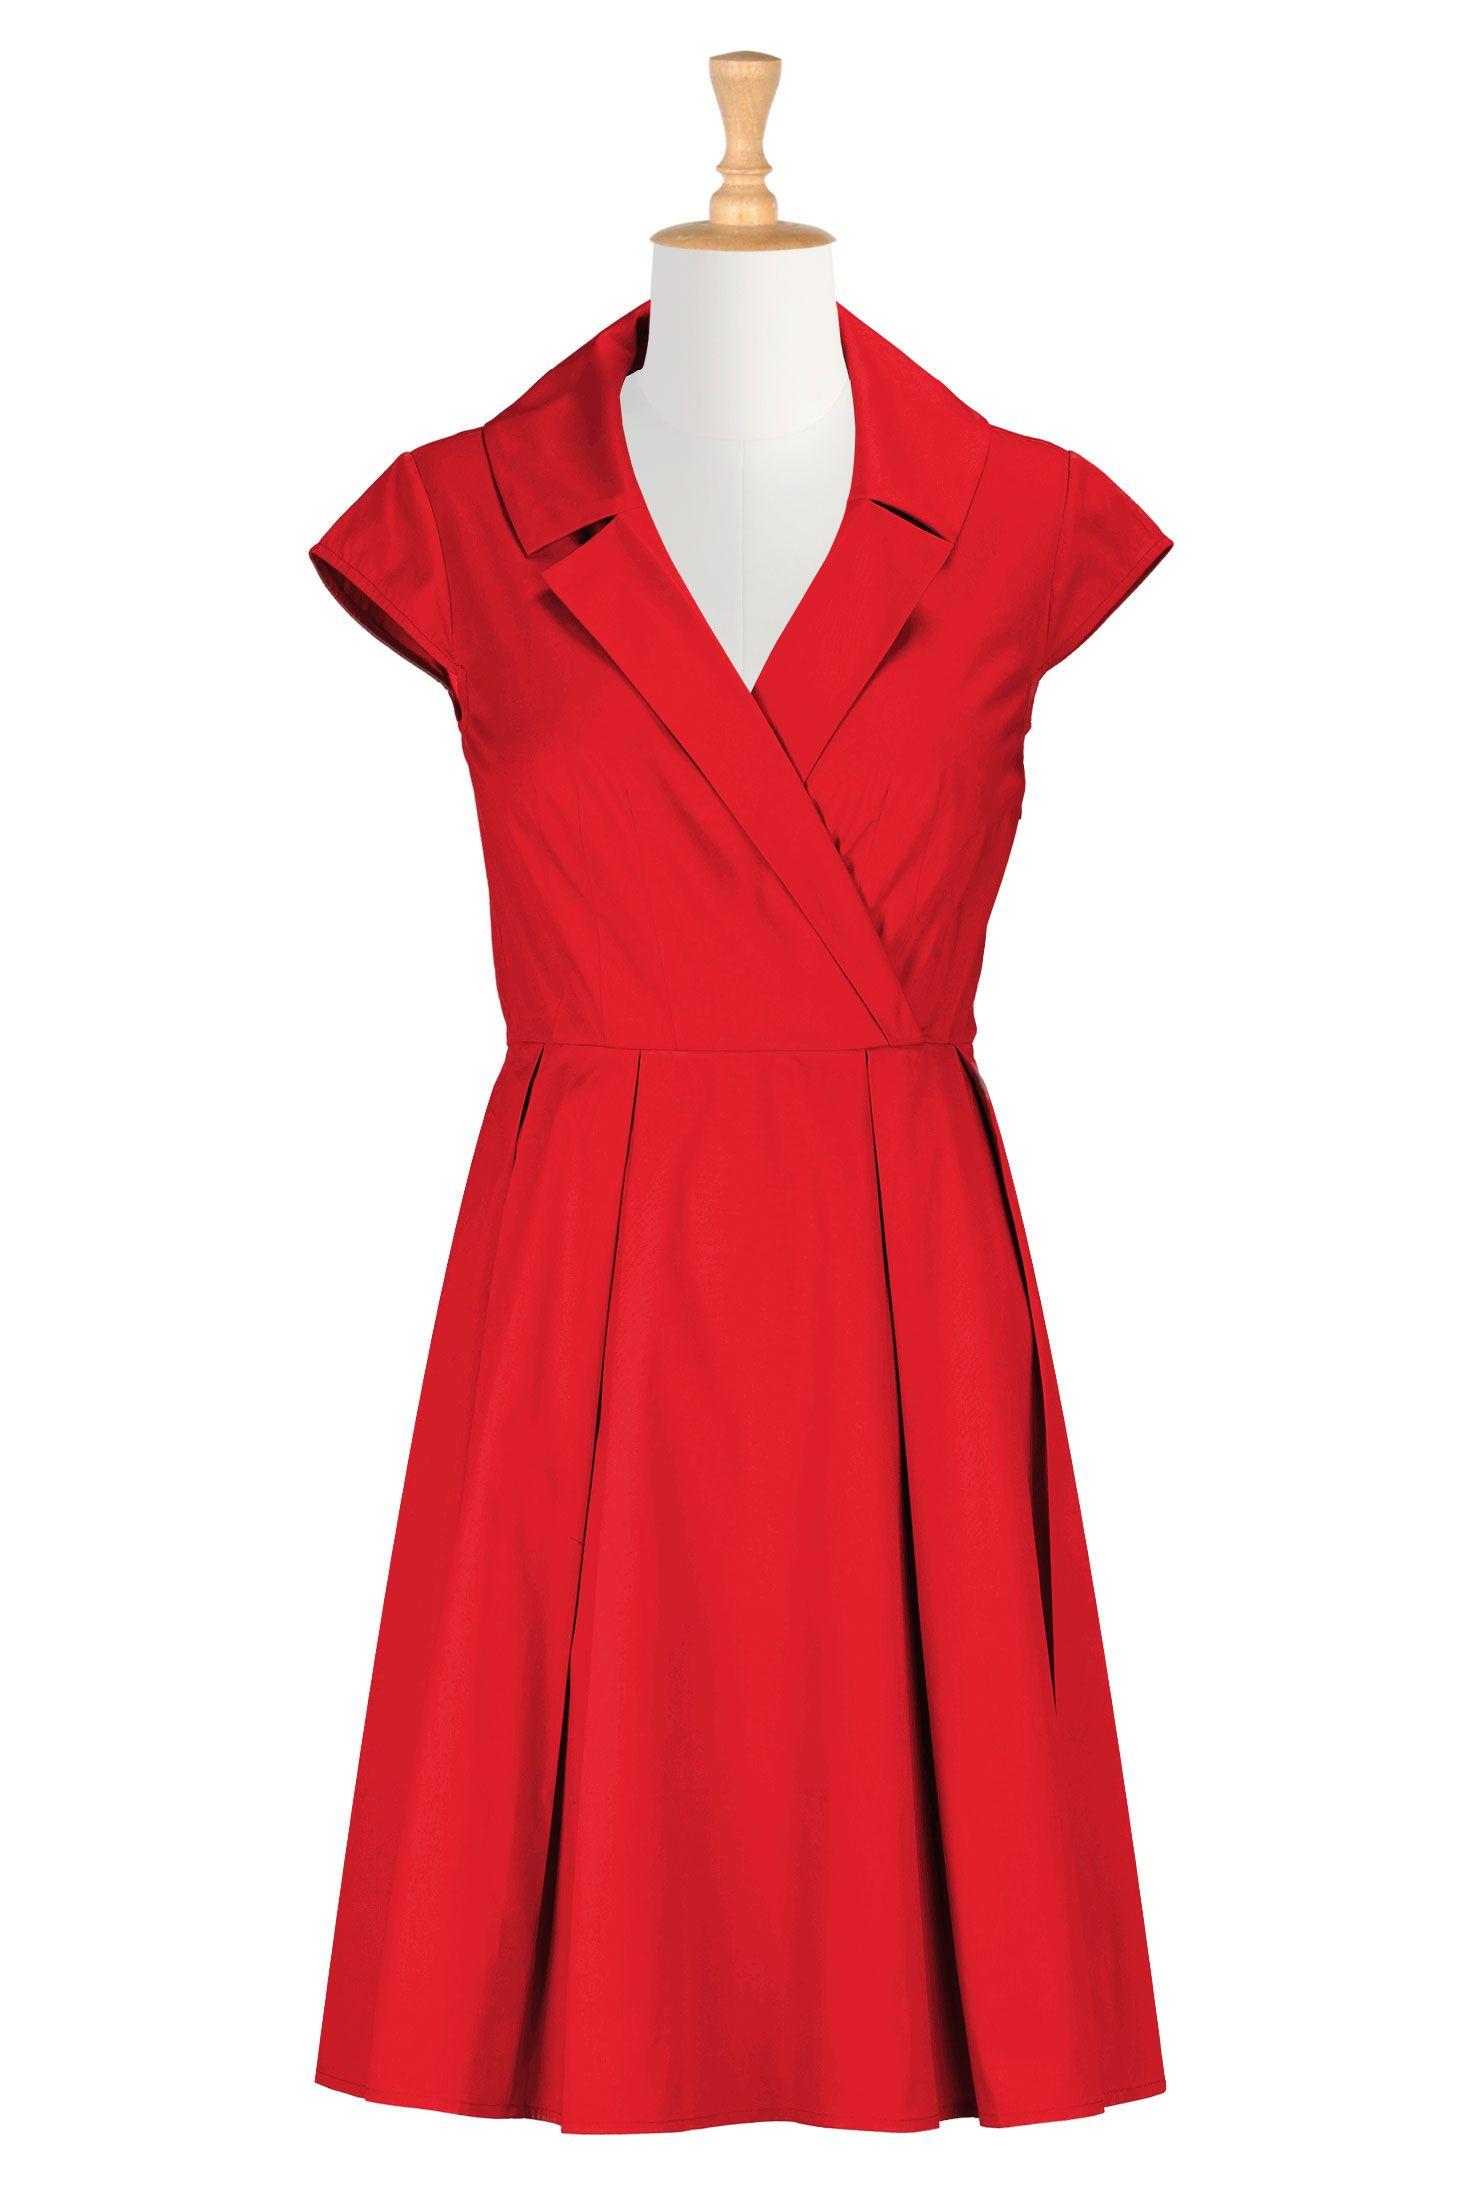 Shop women's fashion design | Women | Dresses & Special Occasion | | eShakti.com